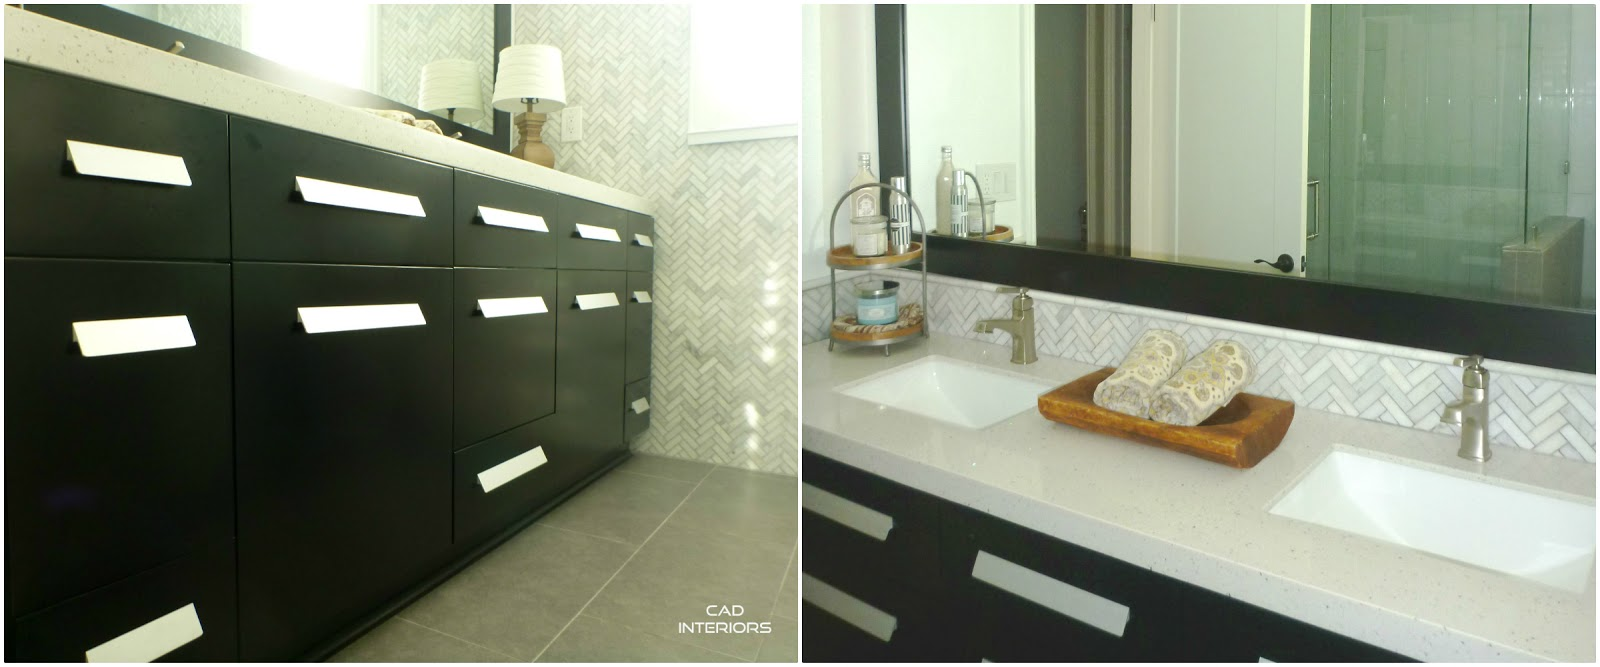 all modern transitional bathroom design interior design renovation